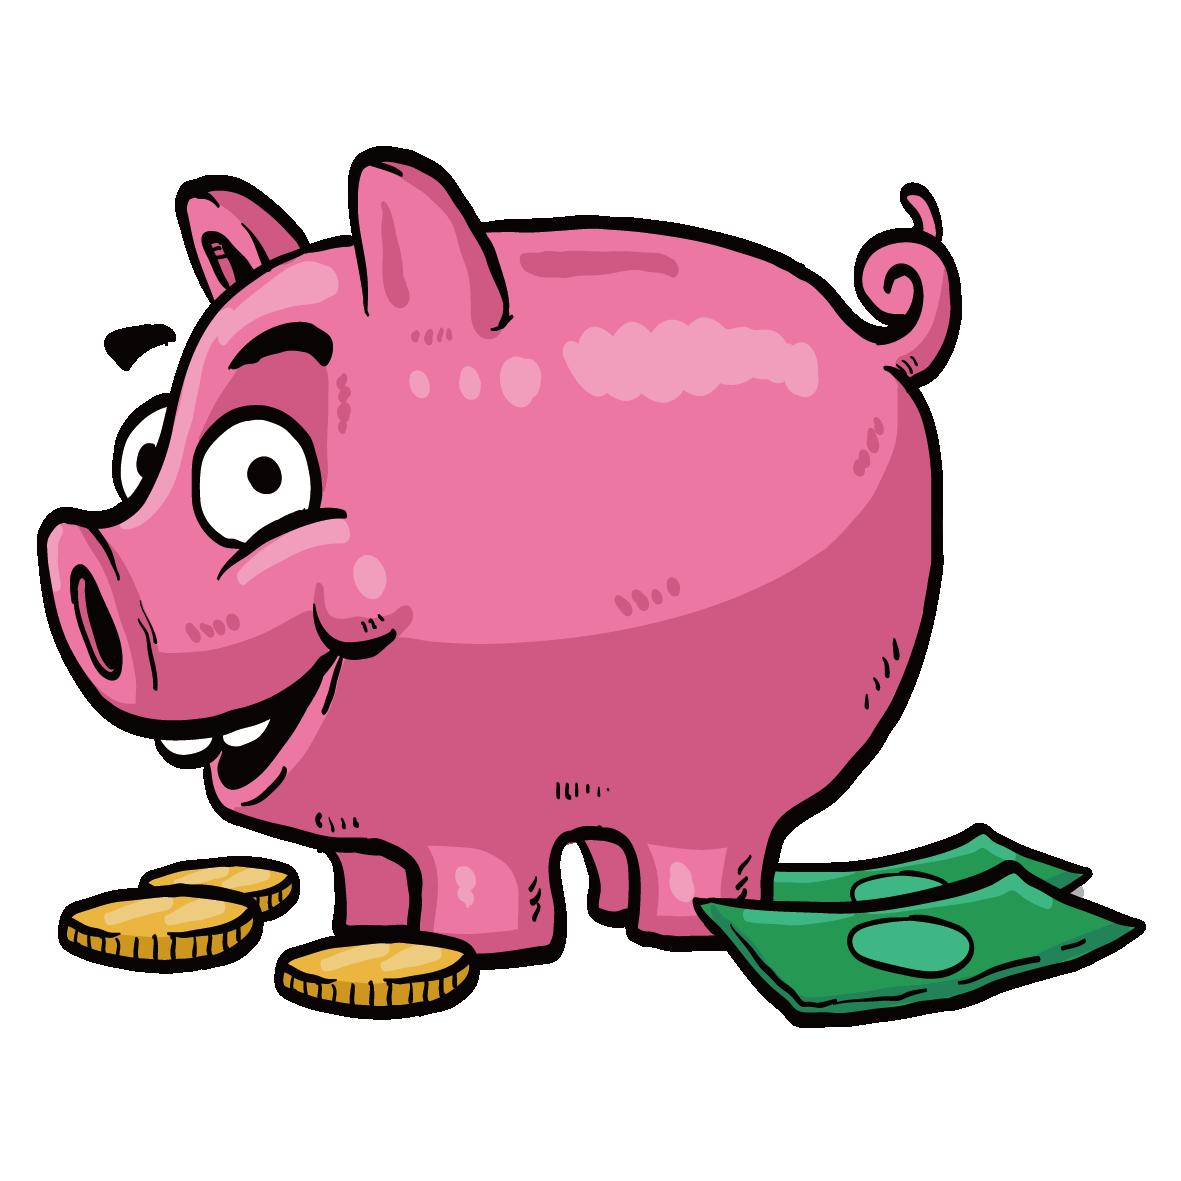 Saving money piggy bank clipart jpg freeuse stock Saving Money Piggy bank Clip art - Piggy bank 1181*1181 transprent ... jpg freeuse stock